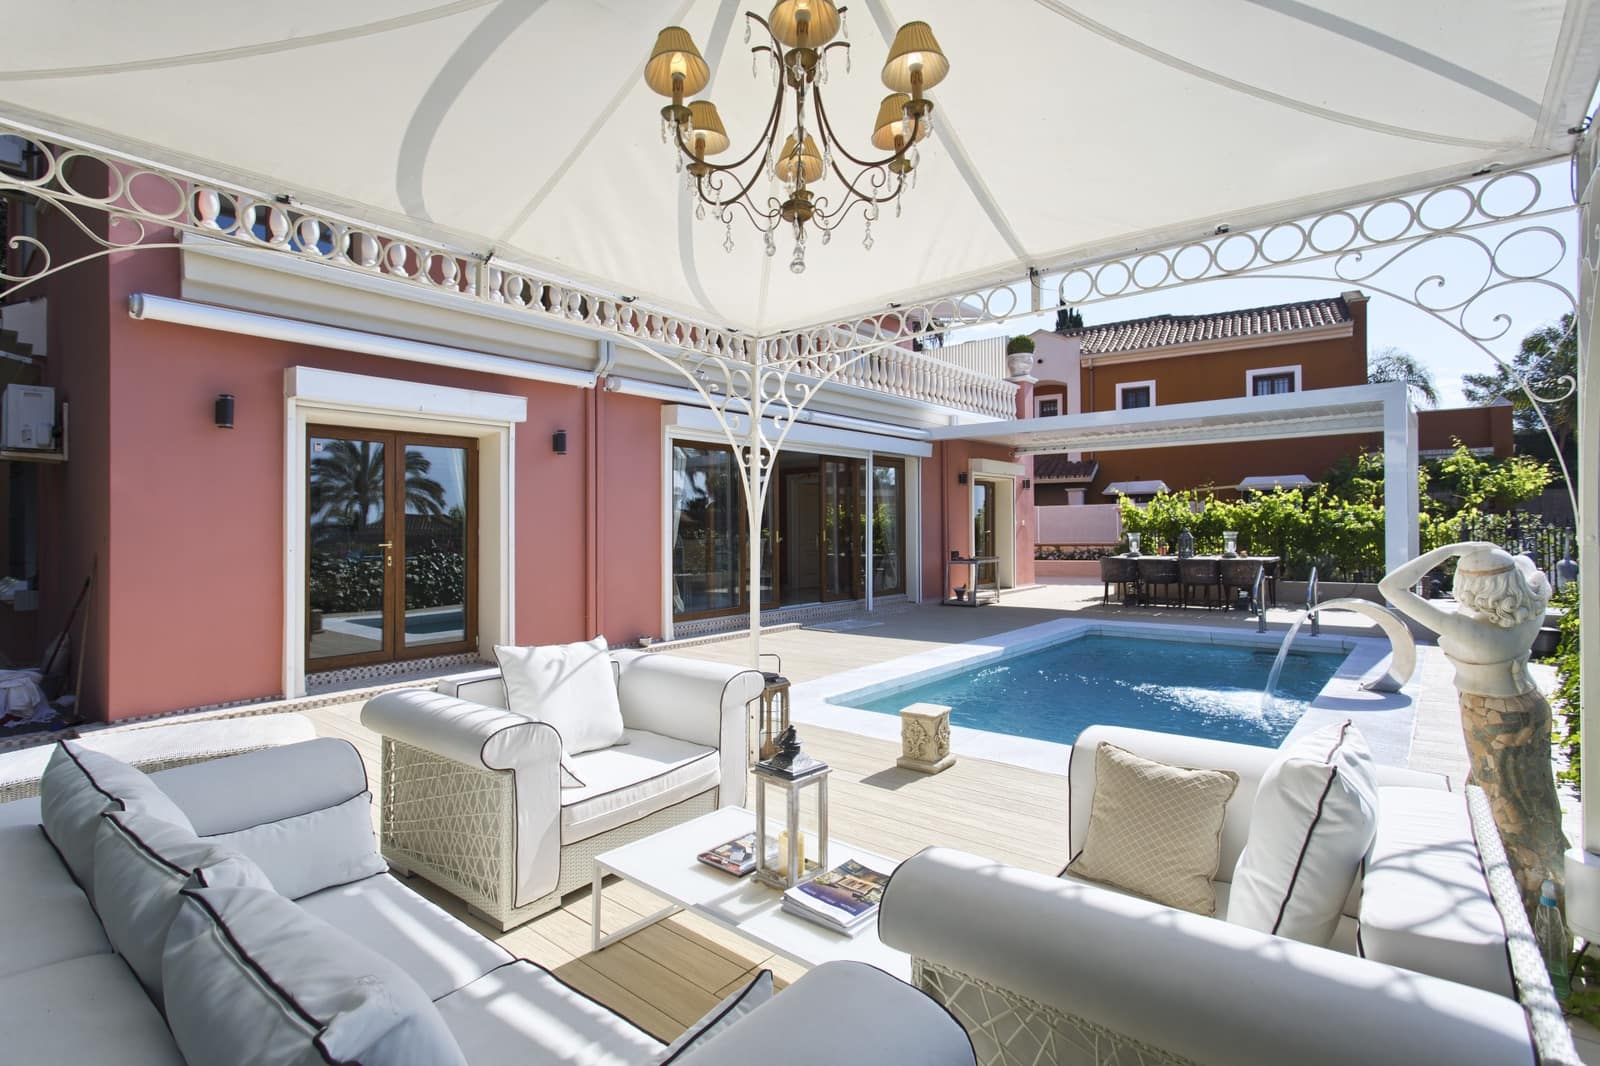 4 bedroom Villa for sale in Marbella with pool - € 1,495,000 (Ref: 4823827)